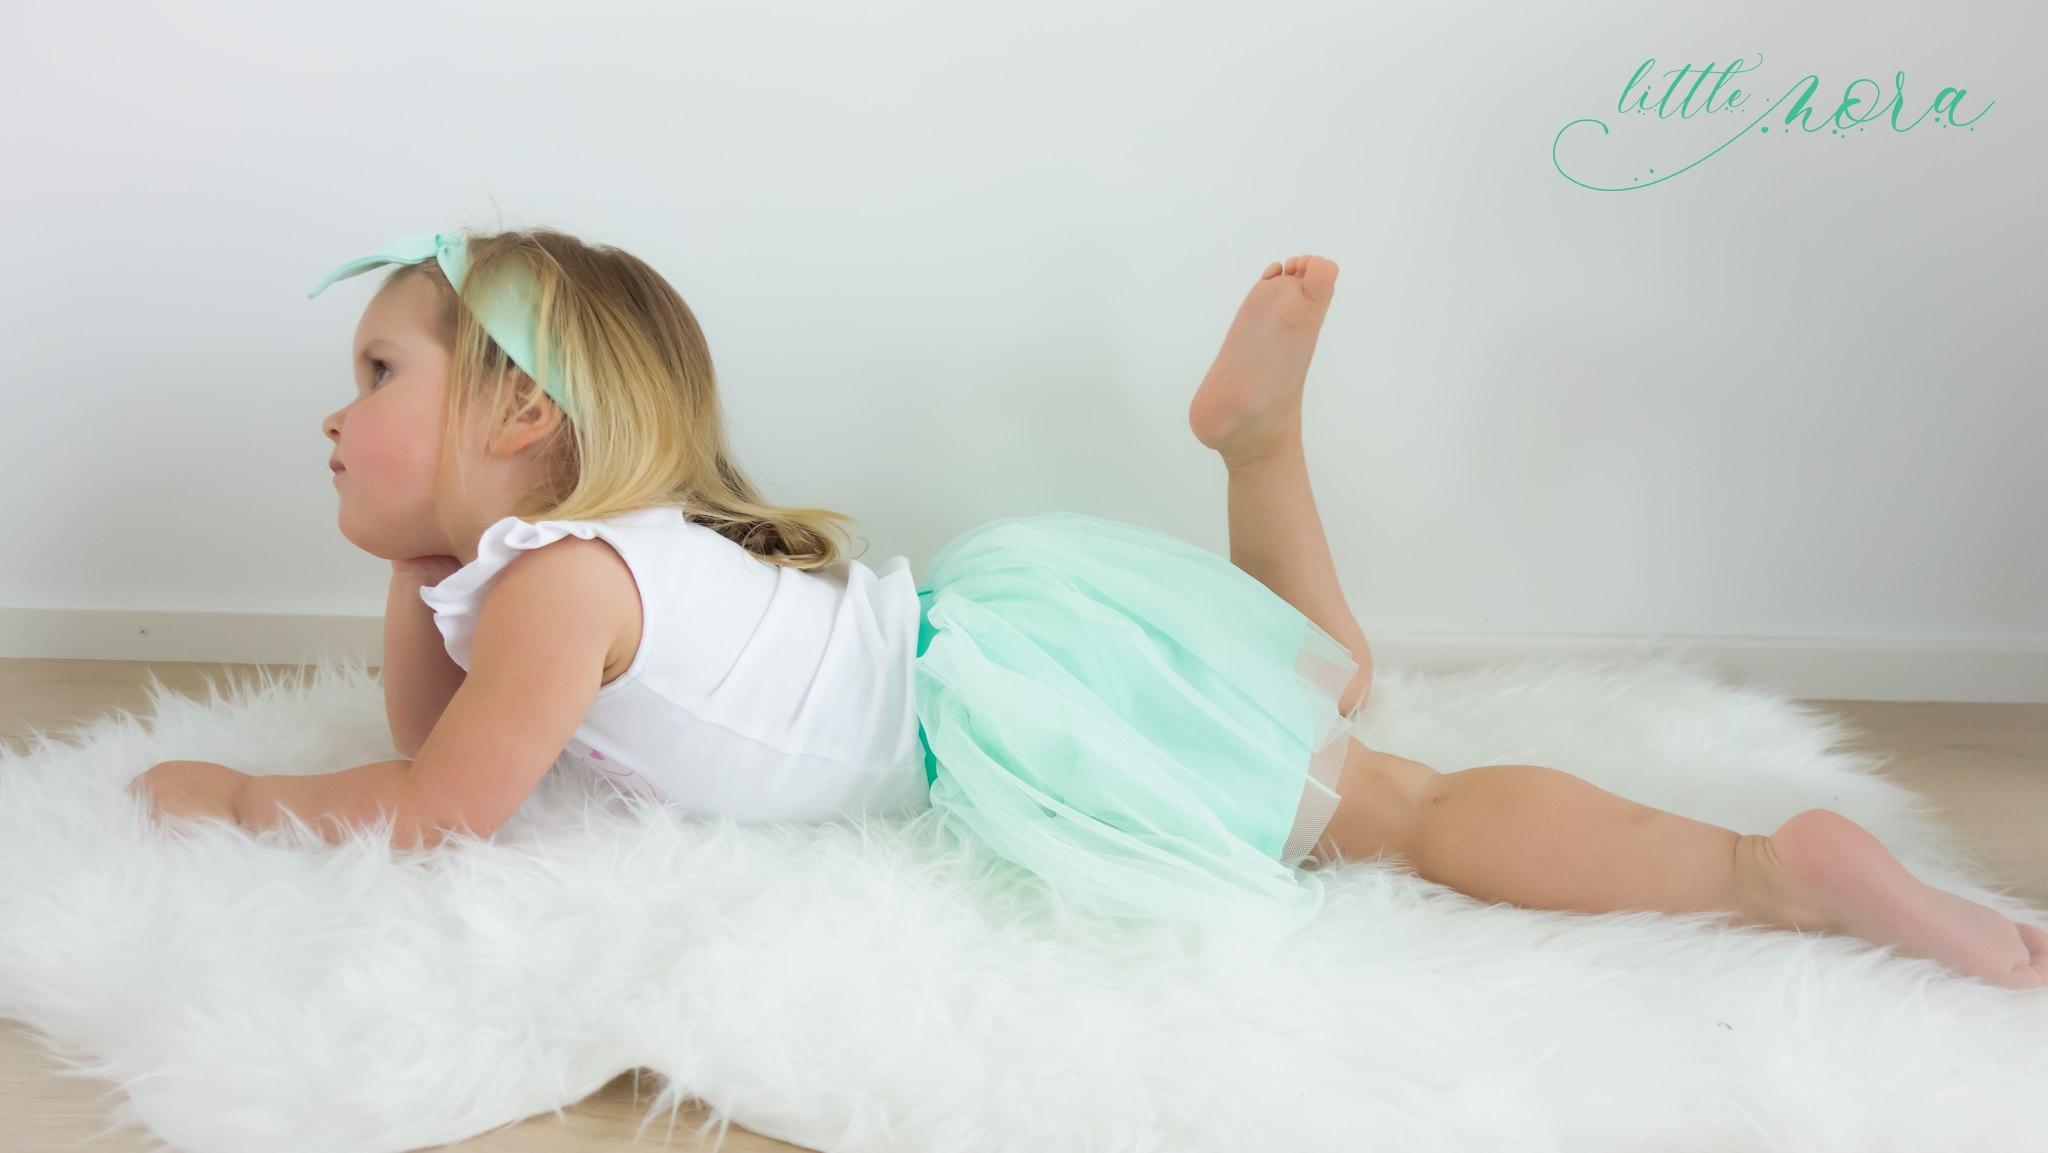 Berühmt Kostenlose Nähanleitung – Tüllrock für Kinder selbst nähen – Blog DE61